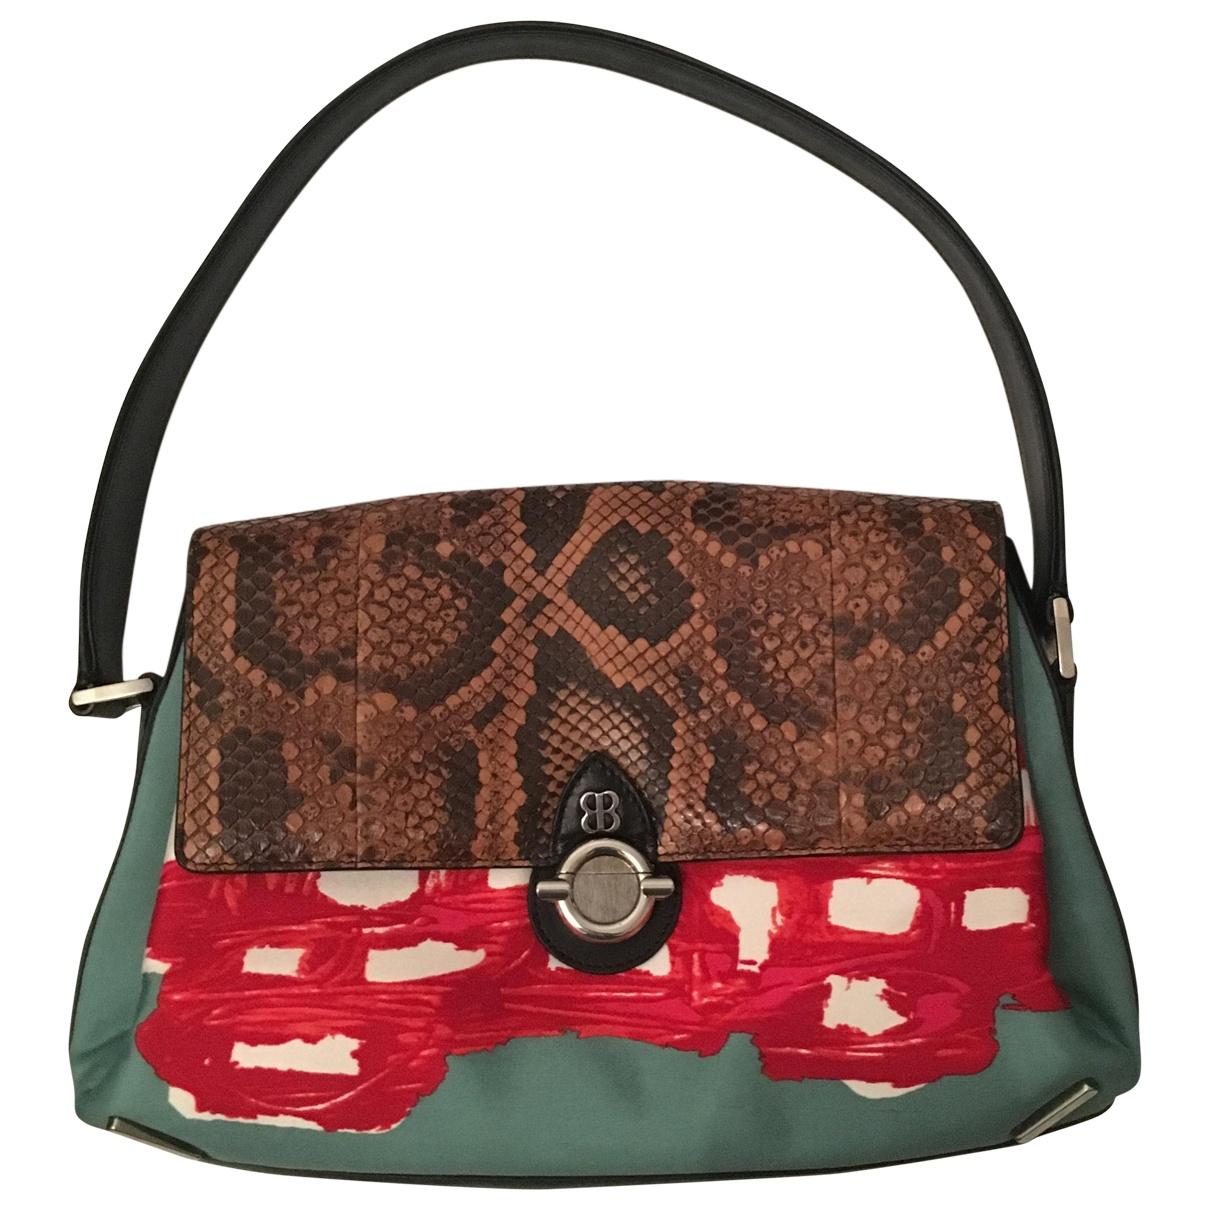 Balenciaga - Sac a main   pour femme en cuir - multicolore